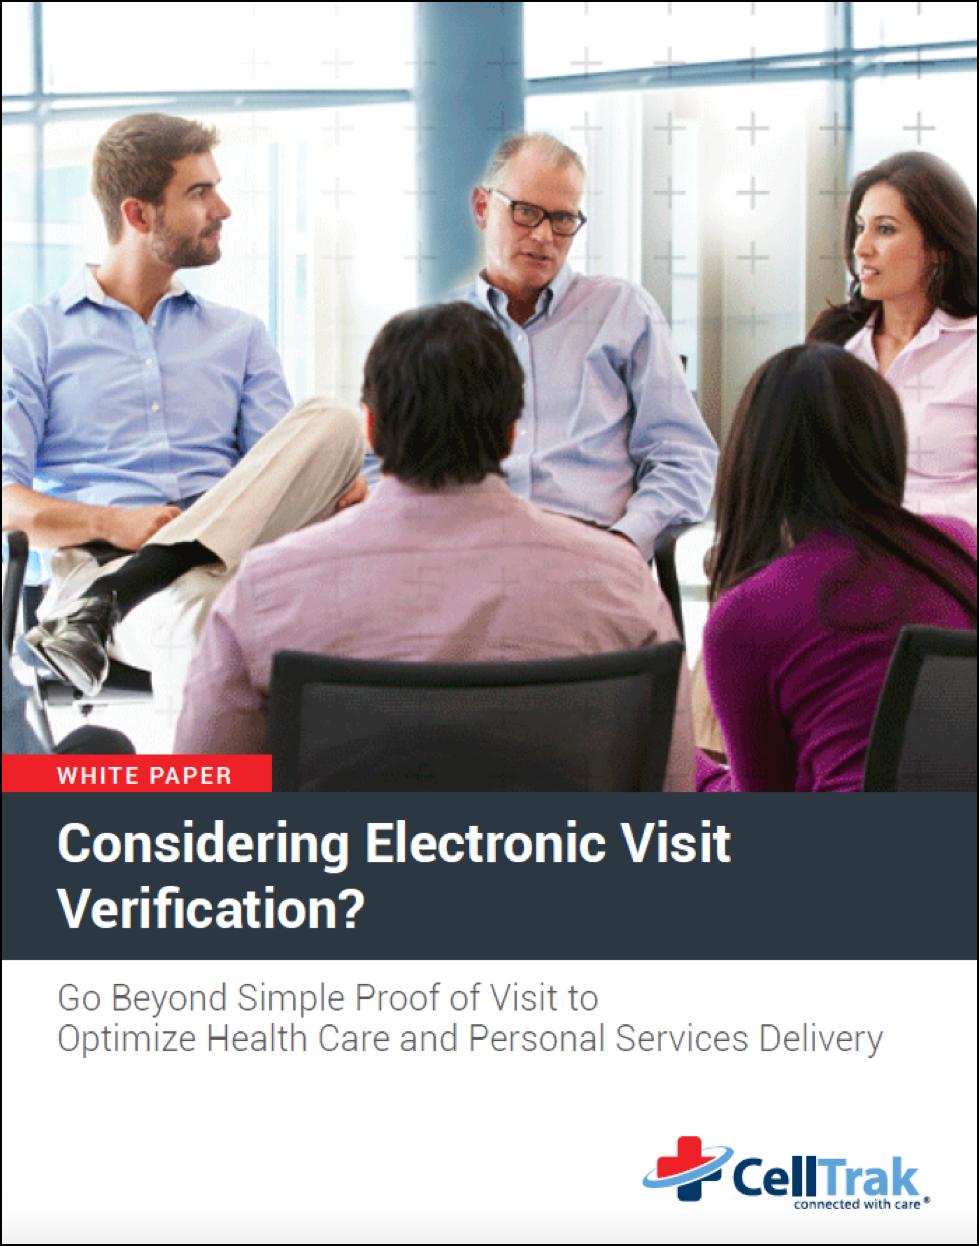 Electronic Visit Verification: Go Beyond Simple Proof